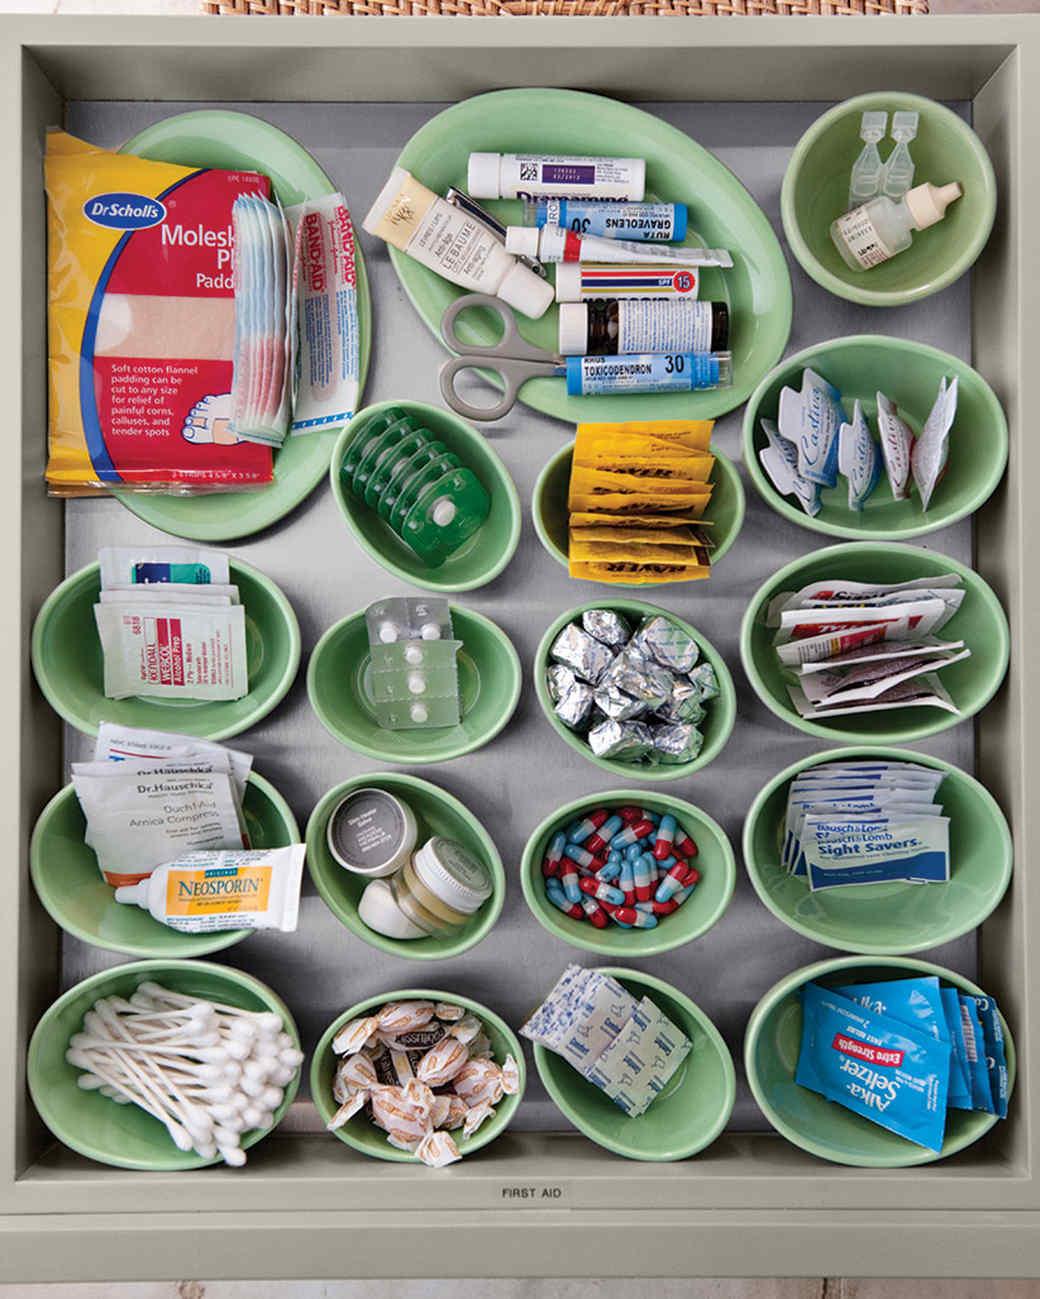 md106031_0910_vitamins_0041.jpg